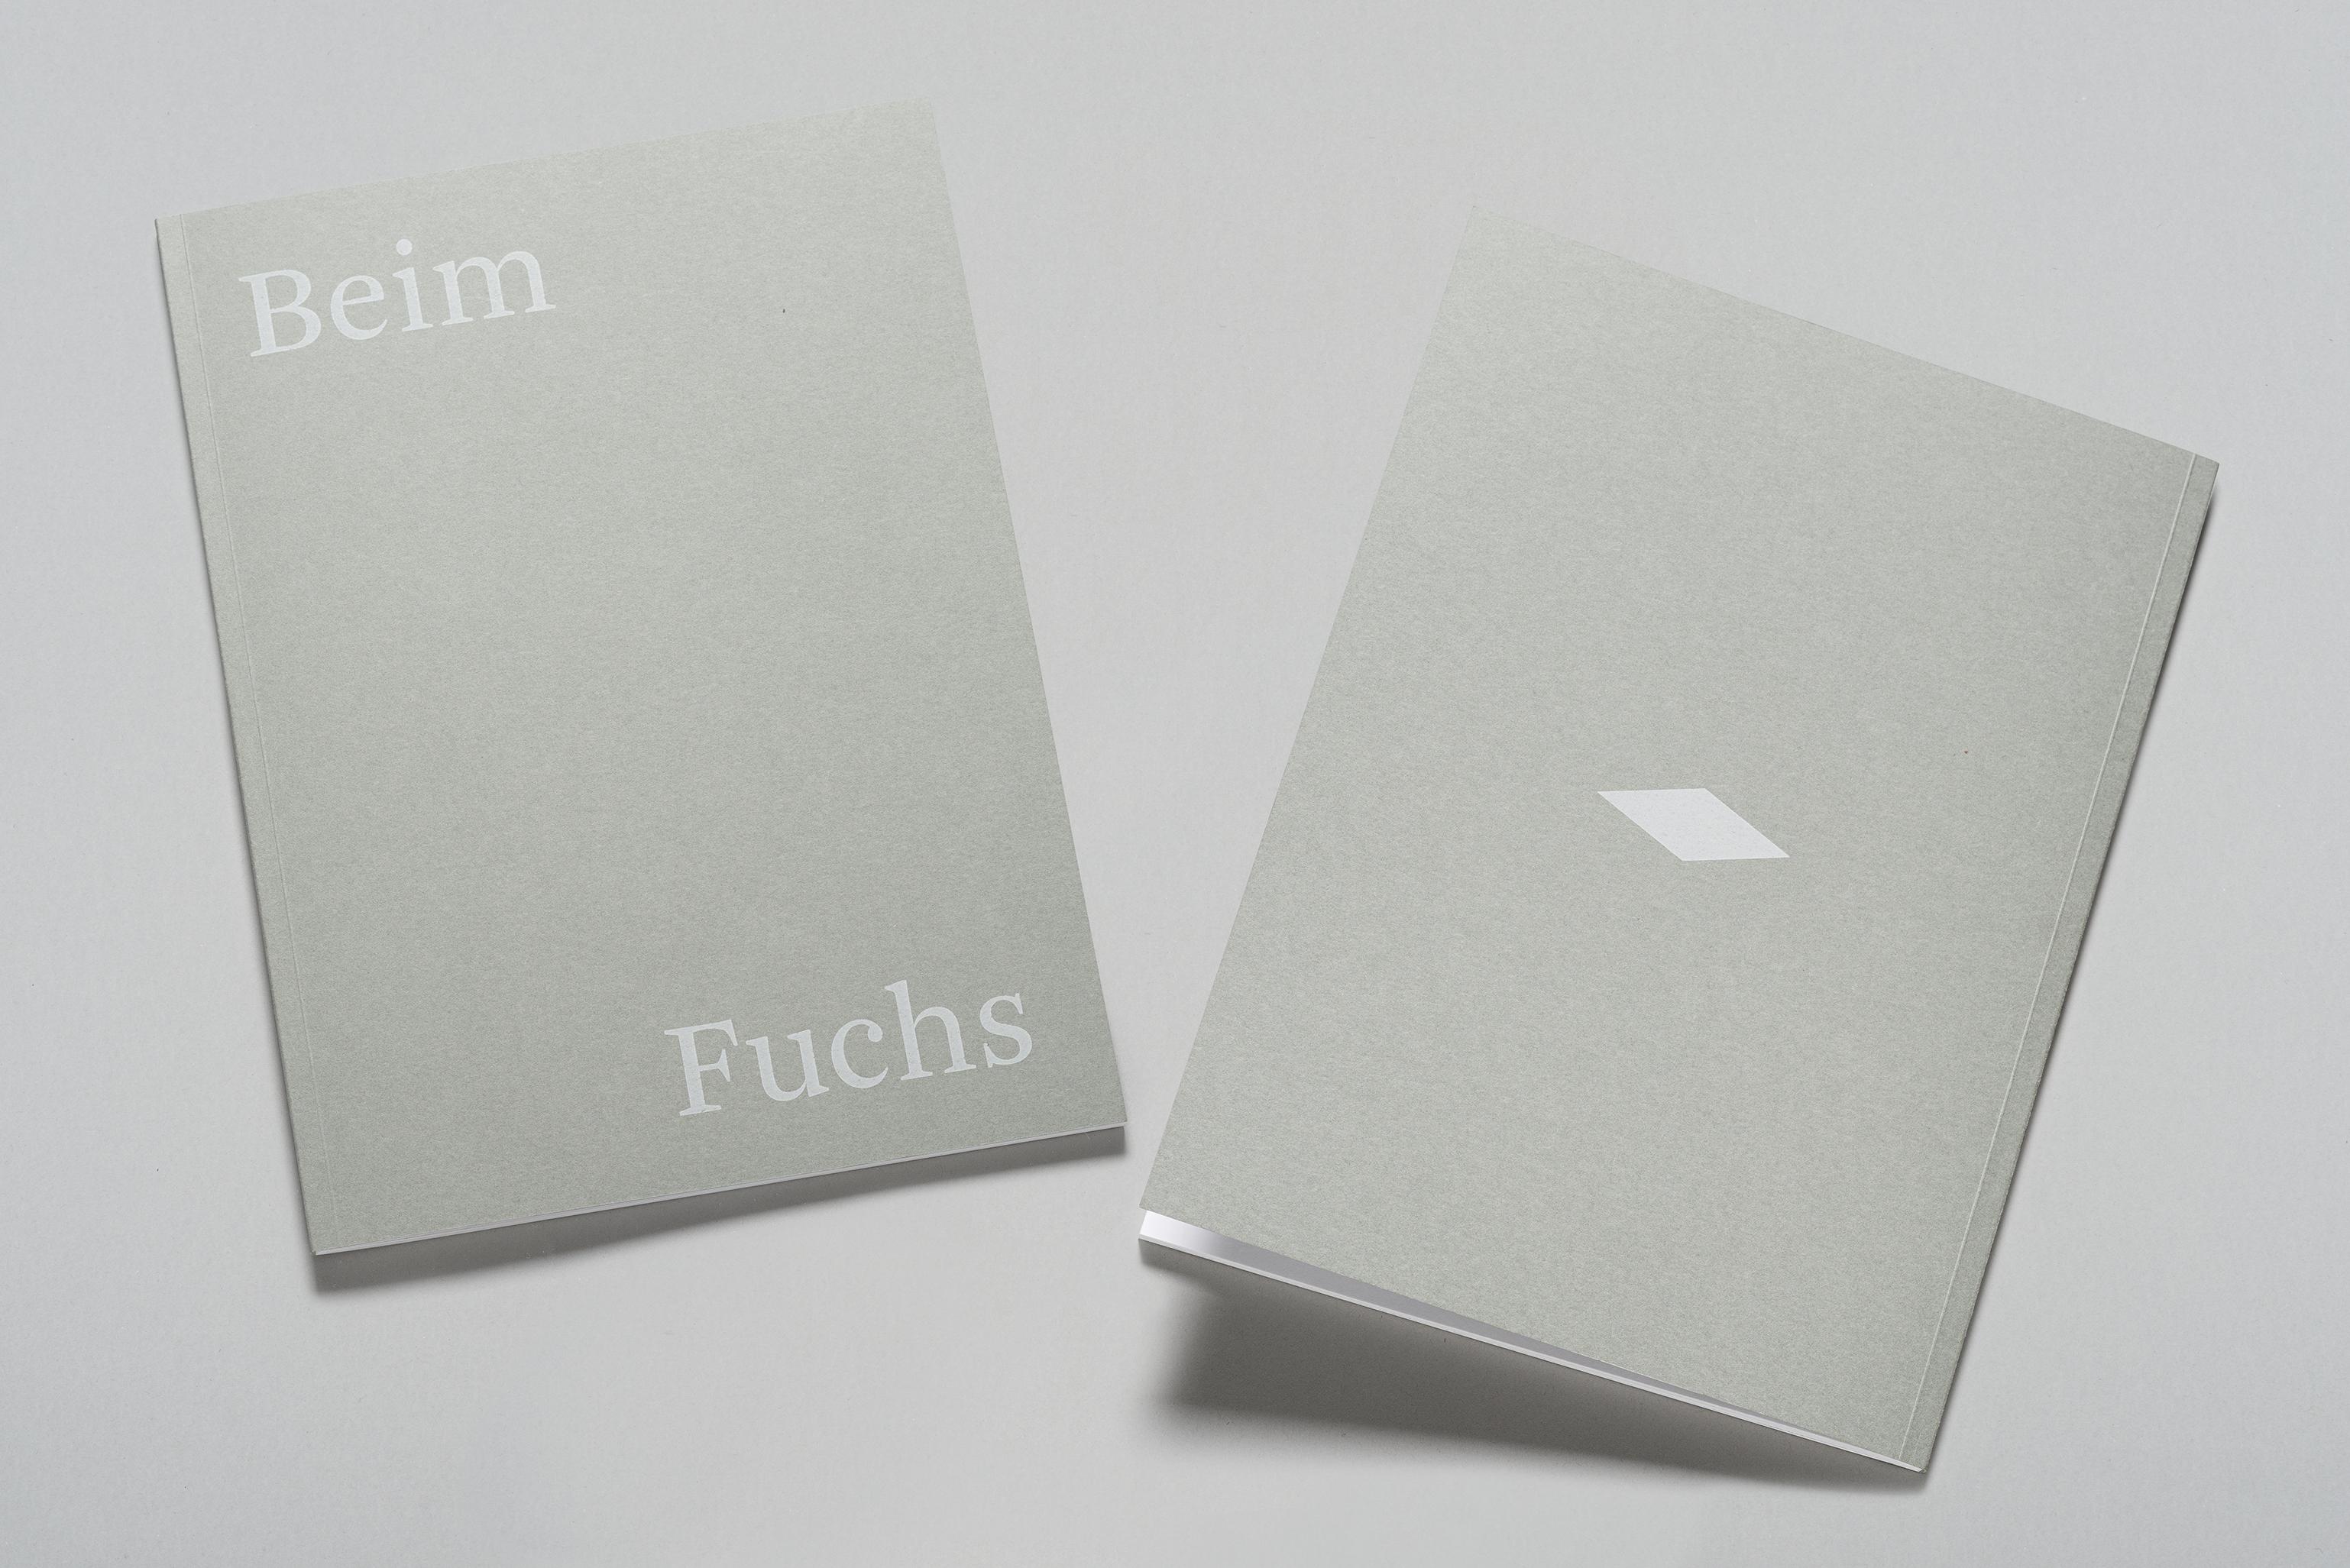 Silke Weigl_Beim Fuchs_01